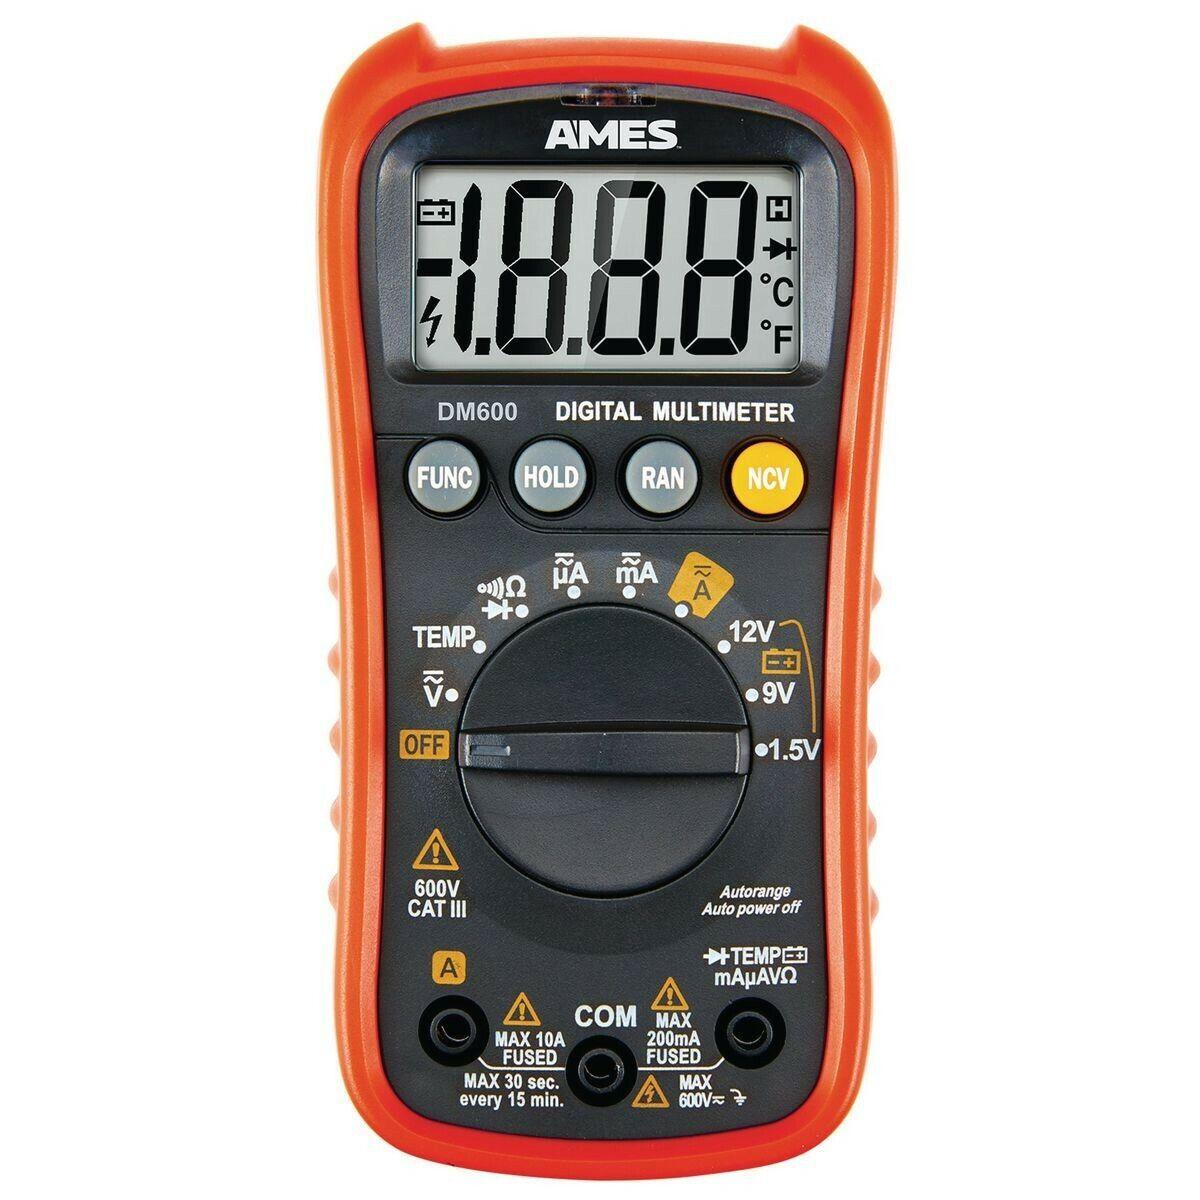 AMES INSTRUMENTS DM600 Compact Digital Multimeter - $29.95